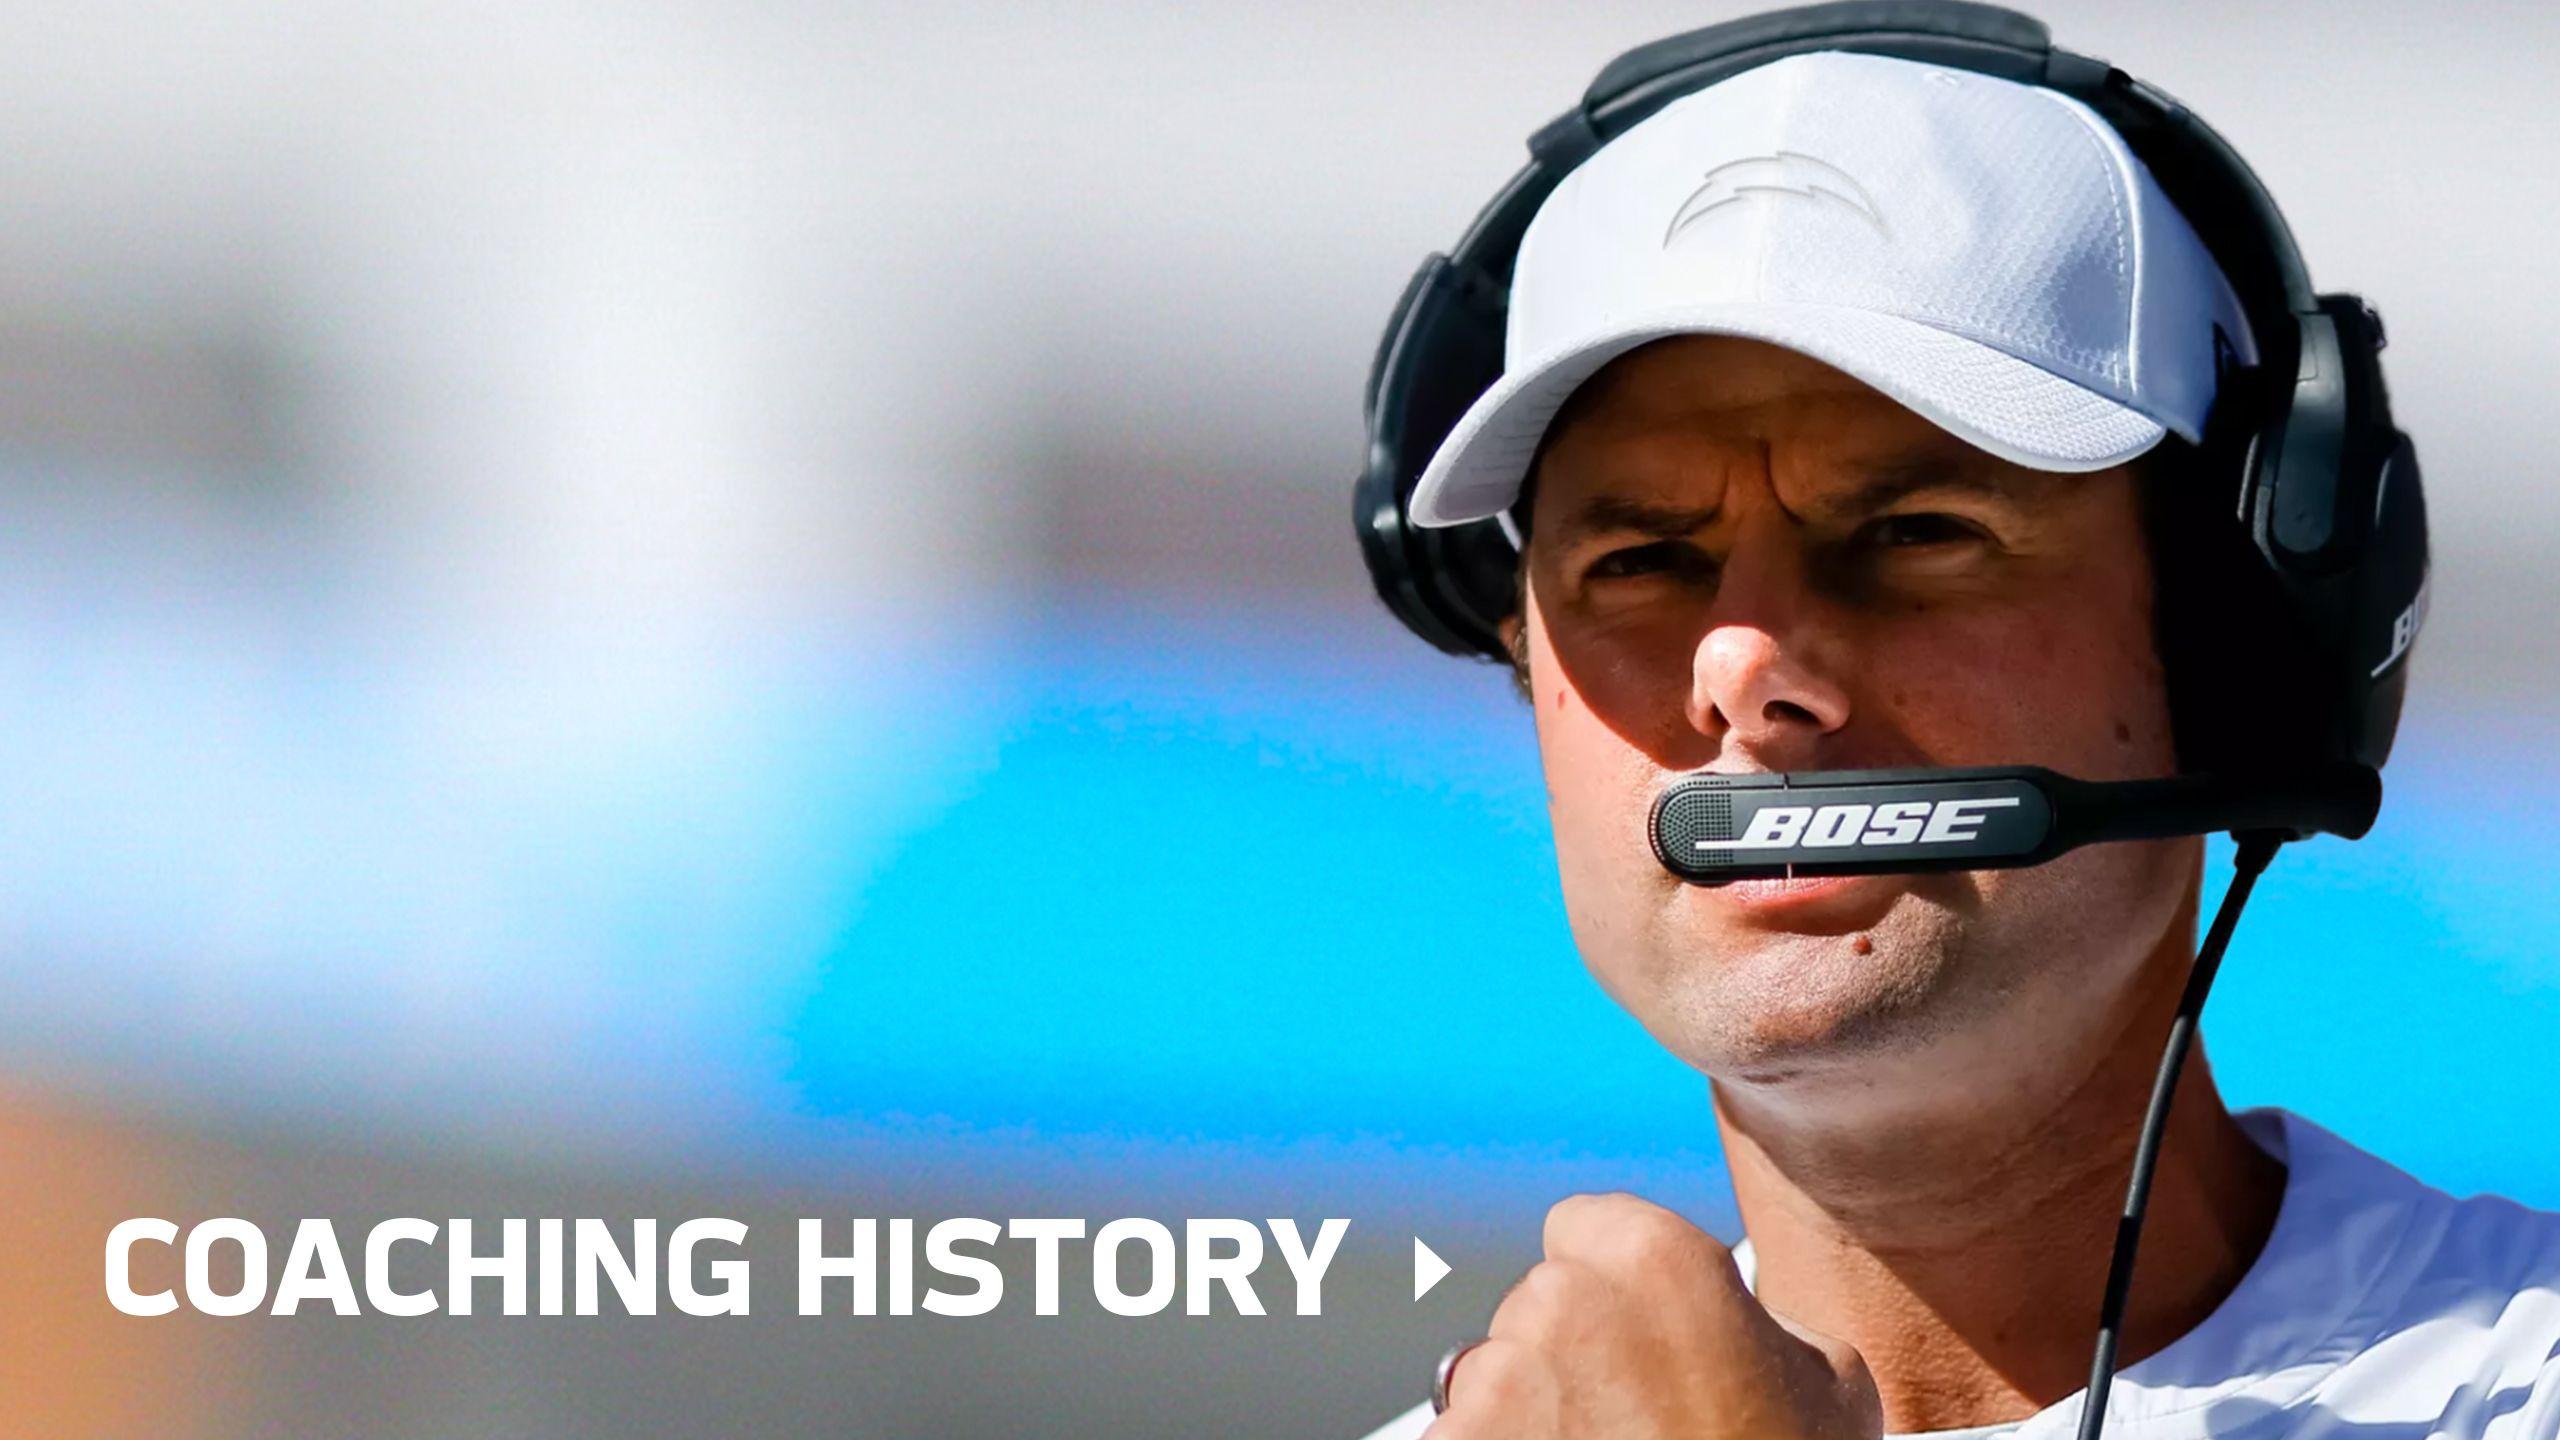 210119_Coaching History_Site_Promo